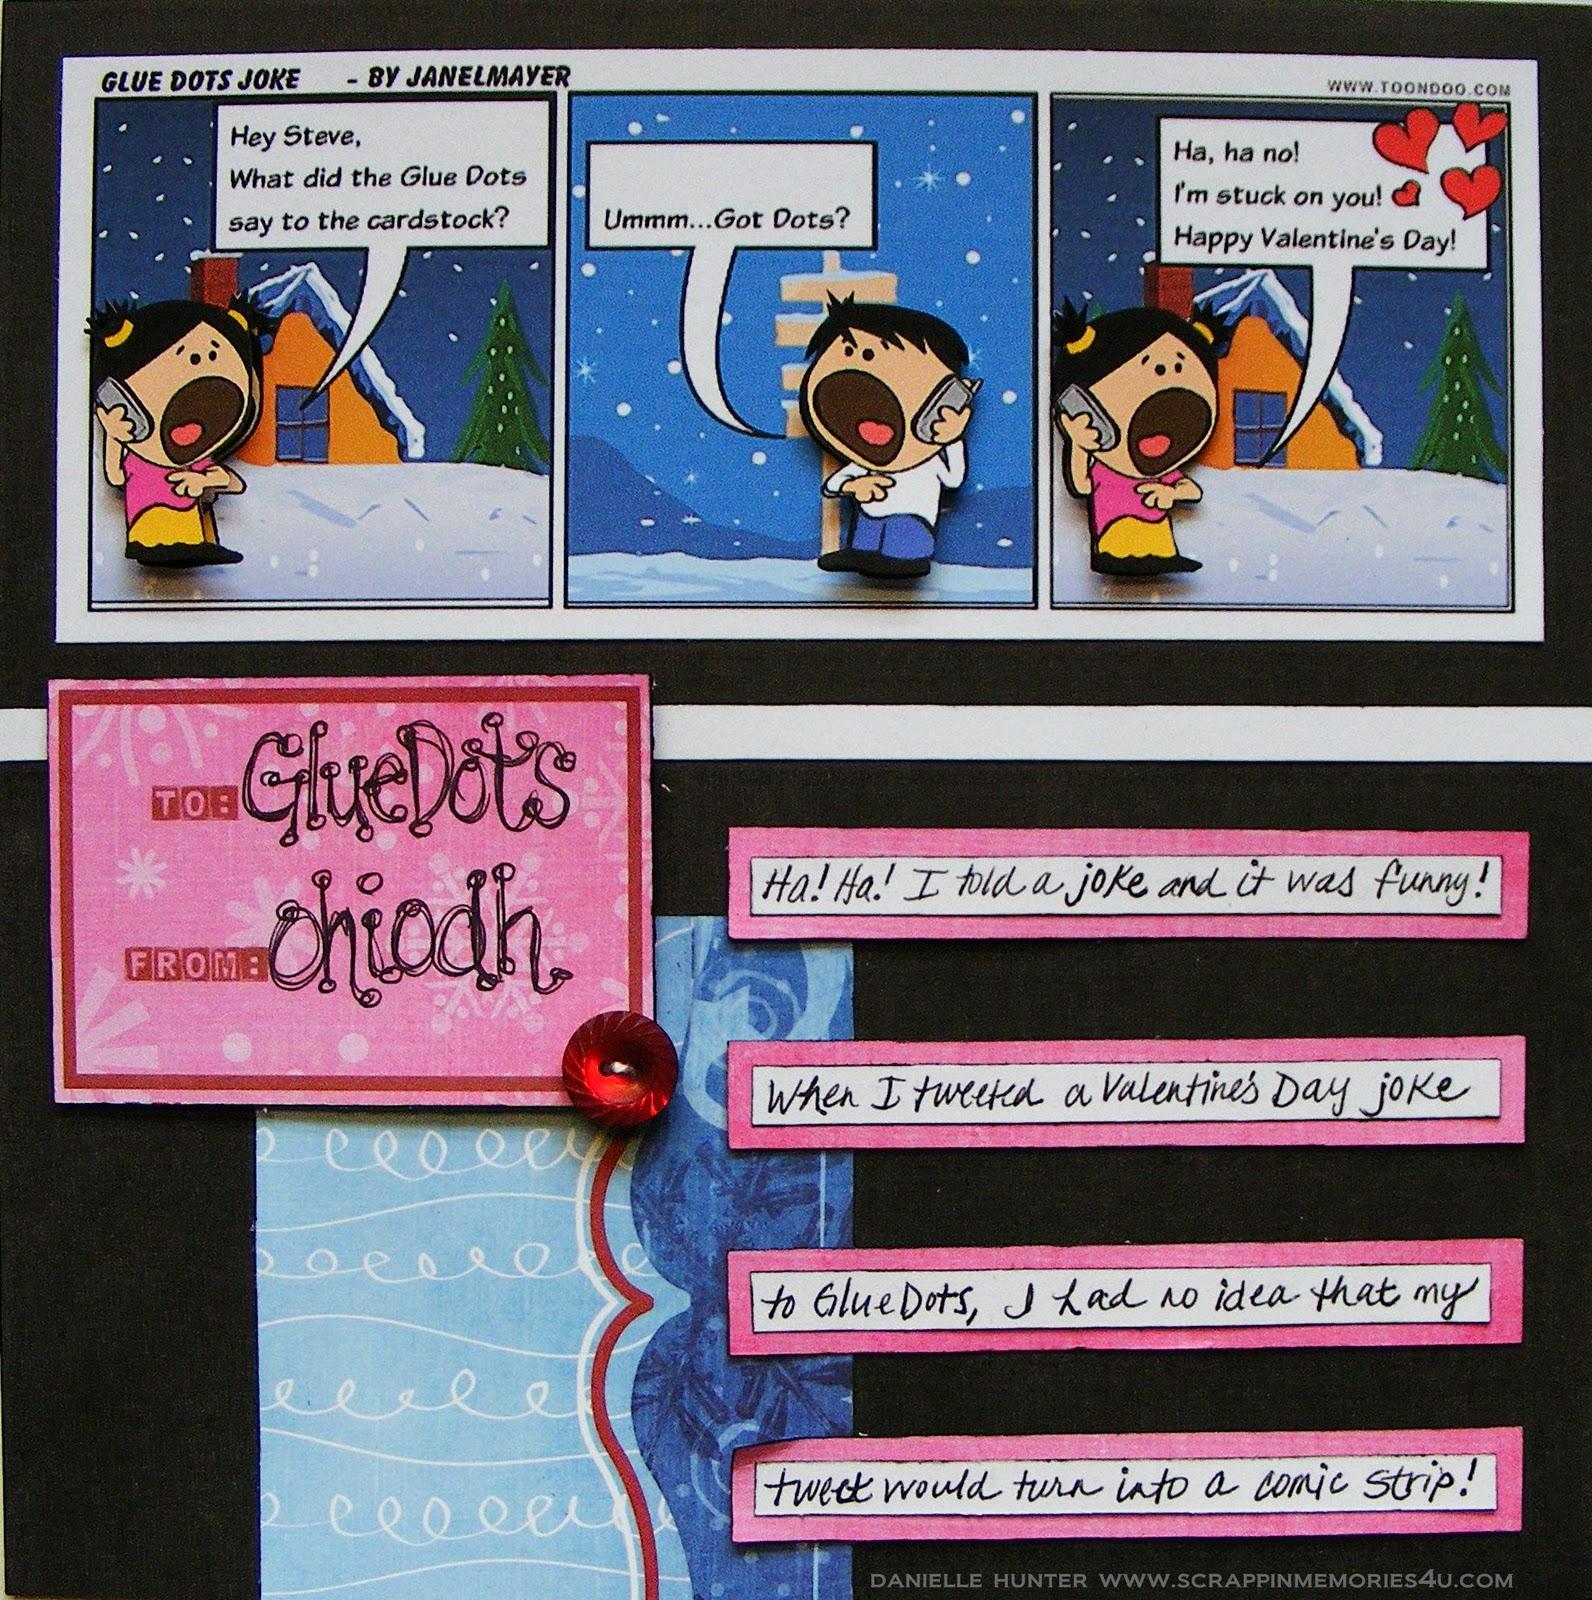 How to scrapbook 8x8 layouts - 8x8 Scrapbook Layout Glue Dots Joke